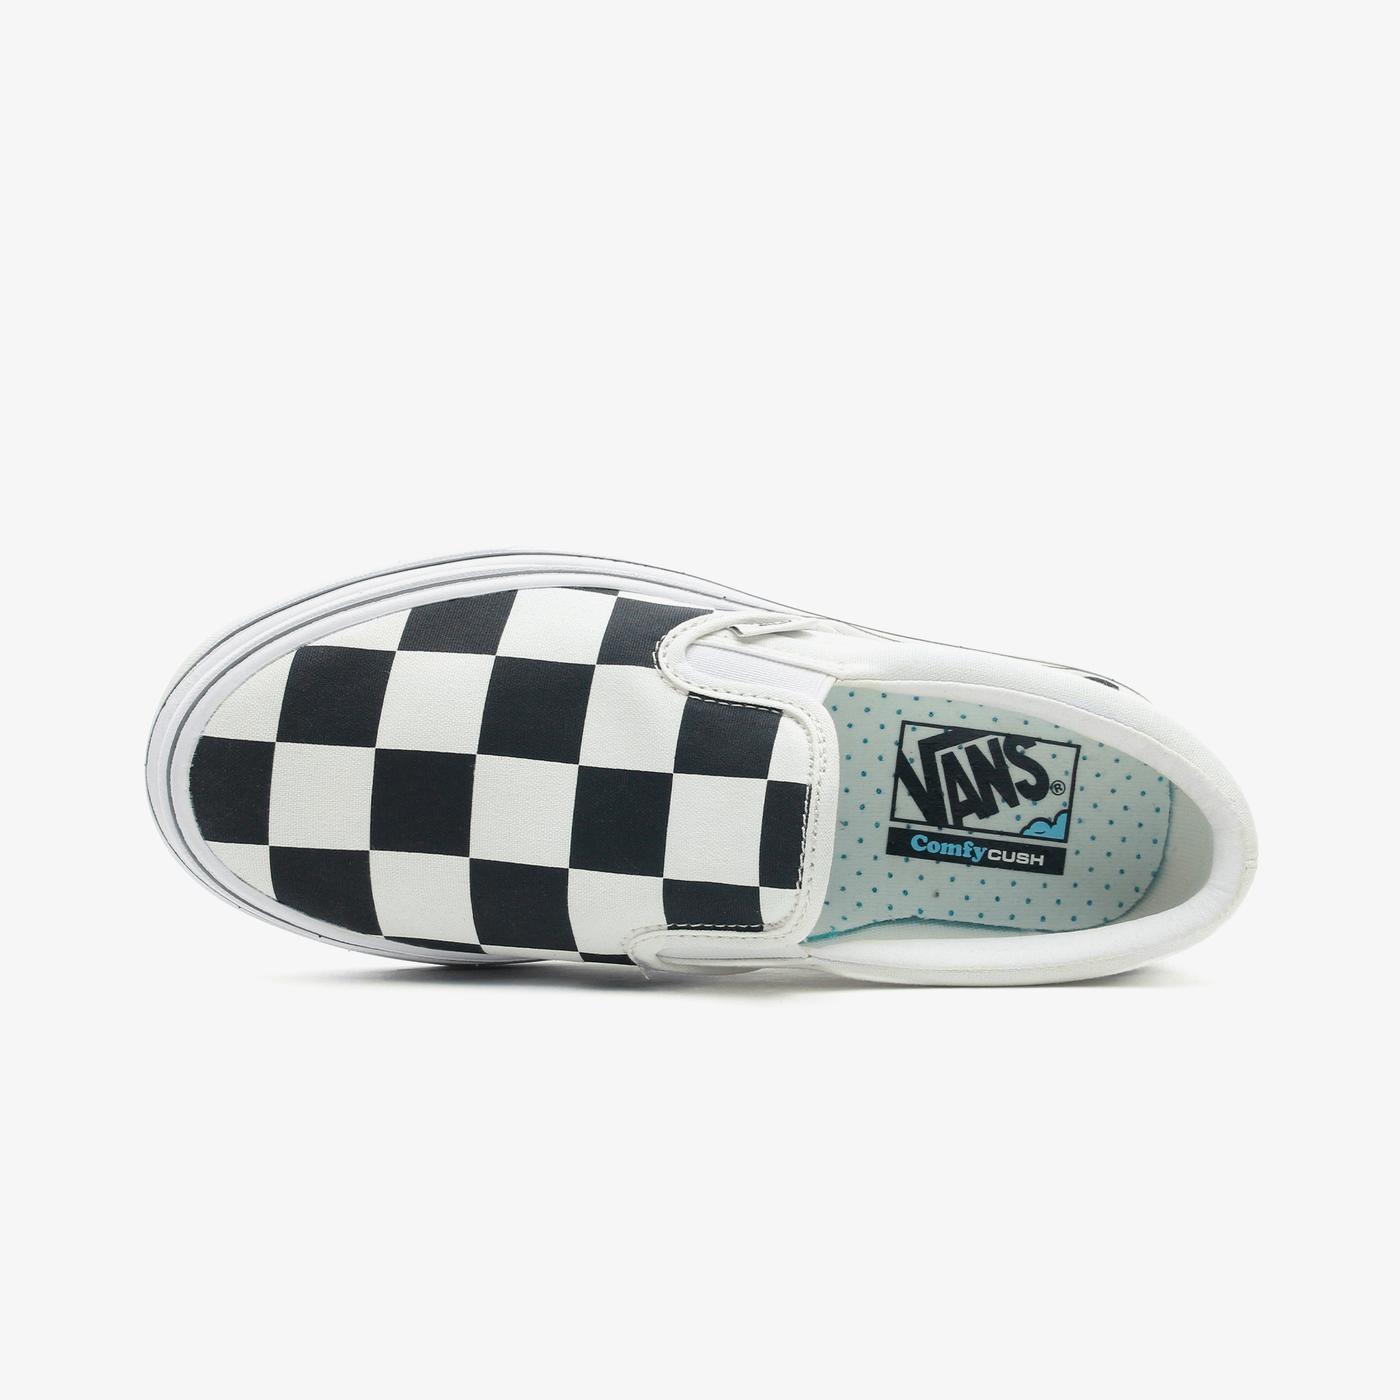 Vans Super ComfyCush Slip-On Kadın Bej-Siyah Sneaker